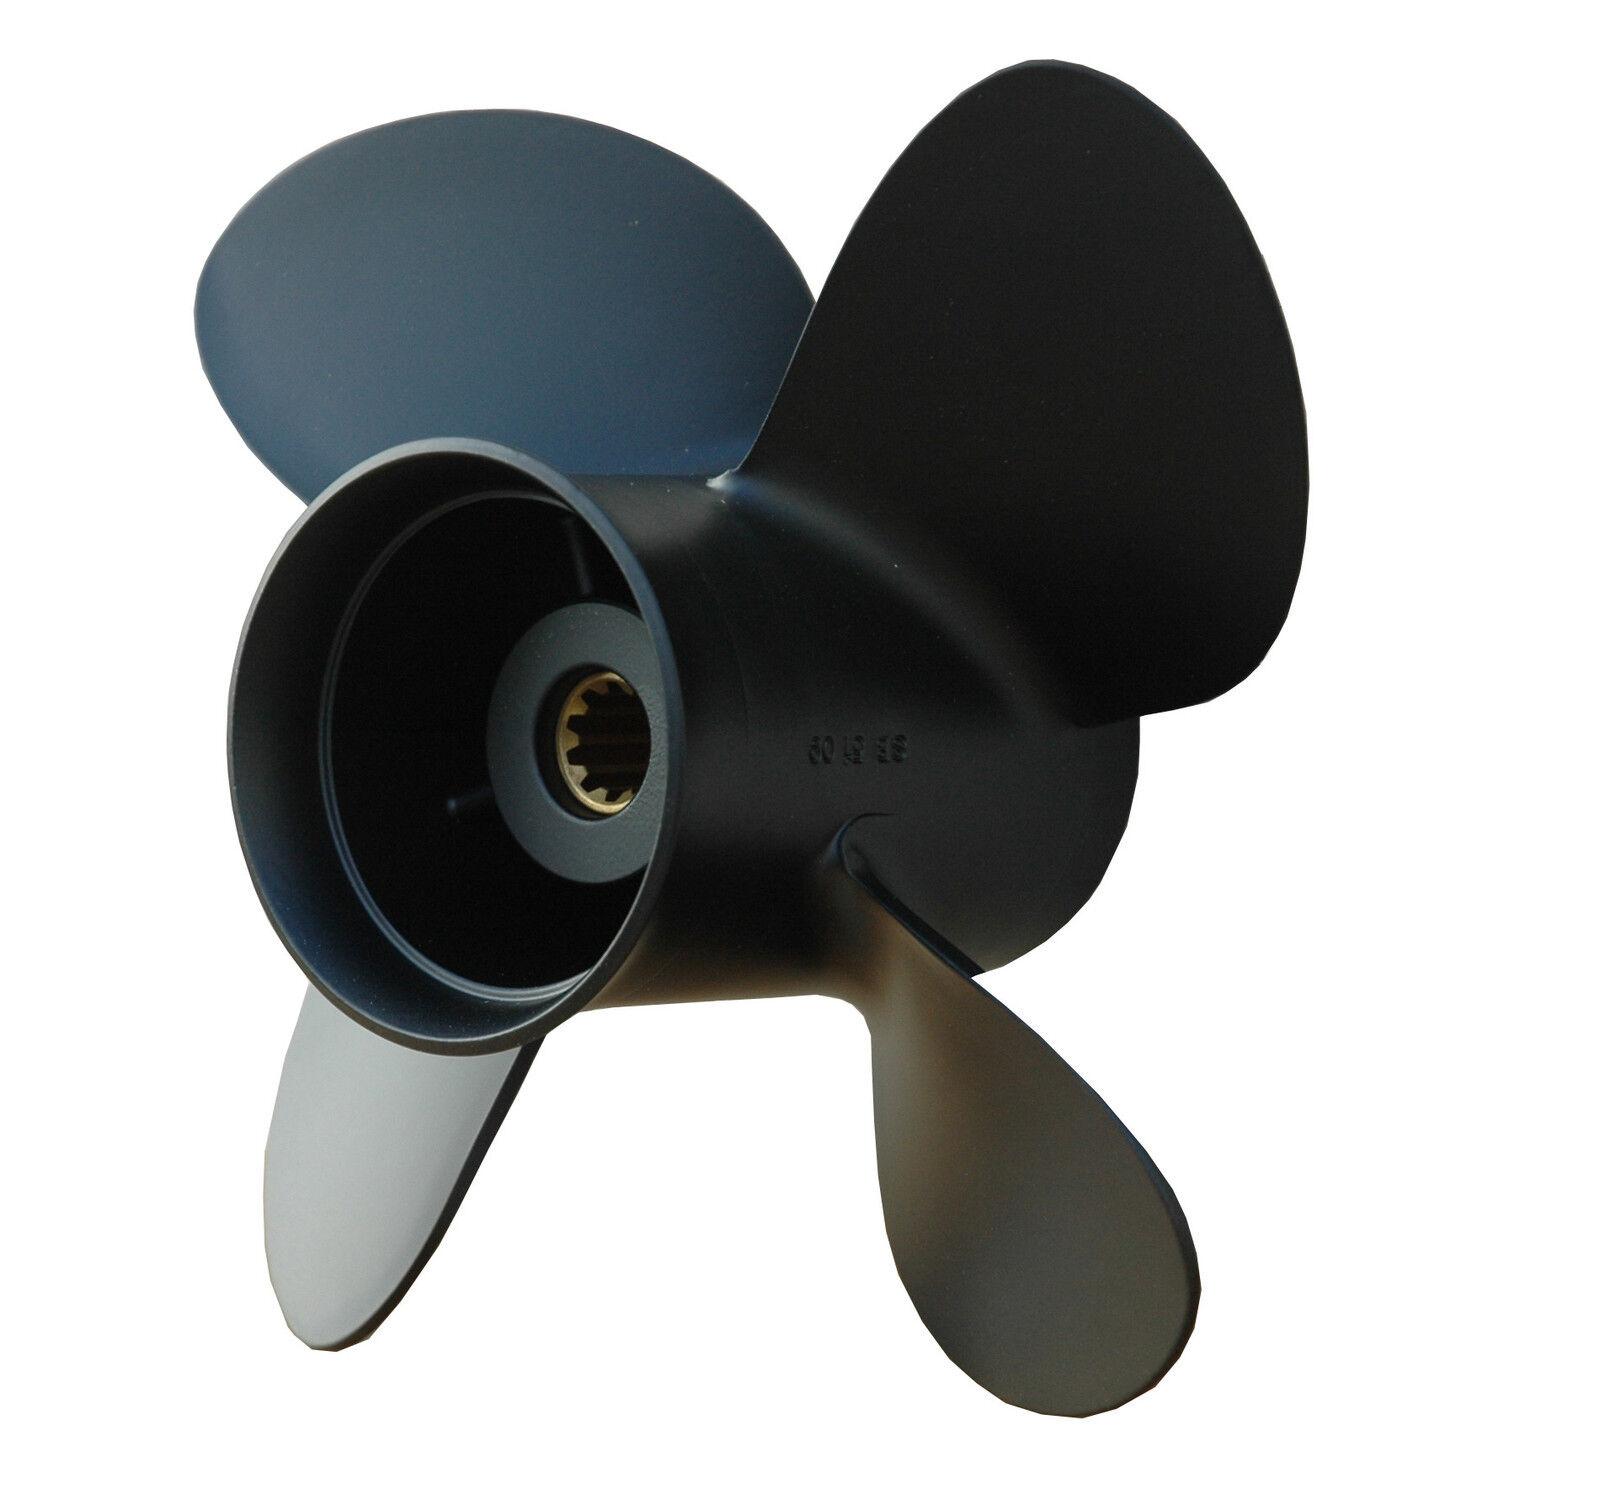 SOLAS Propeller Aluminium 4 Blatt 10 1 5 x 11  Zoll für Mercury 9,9 bis 25 PS